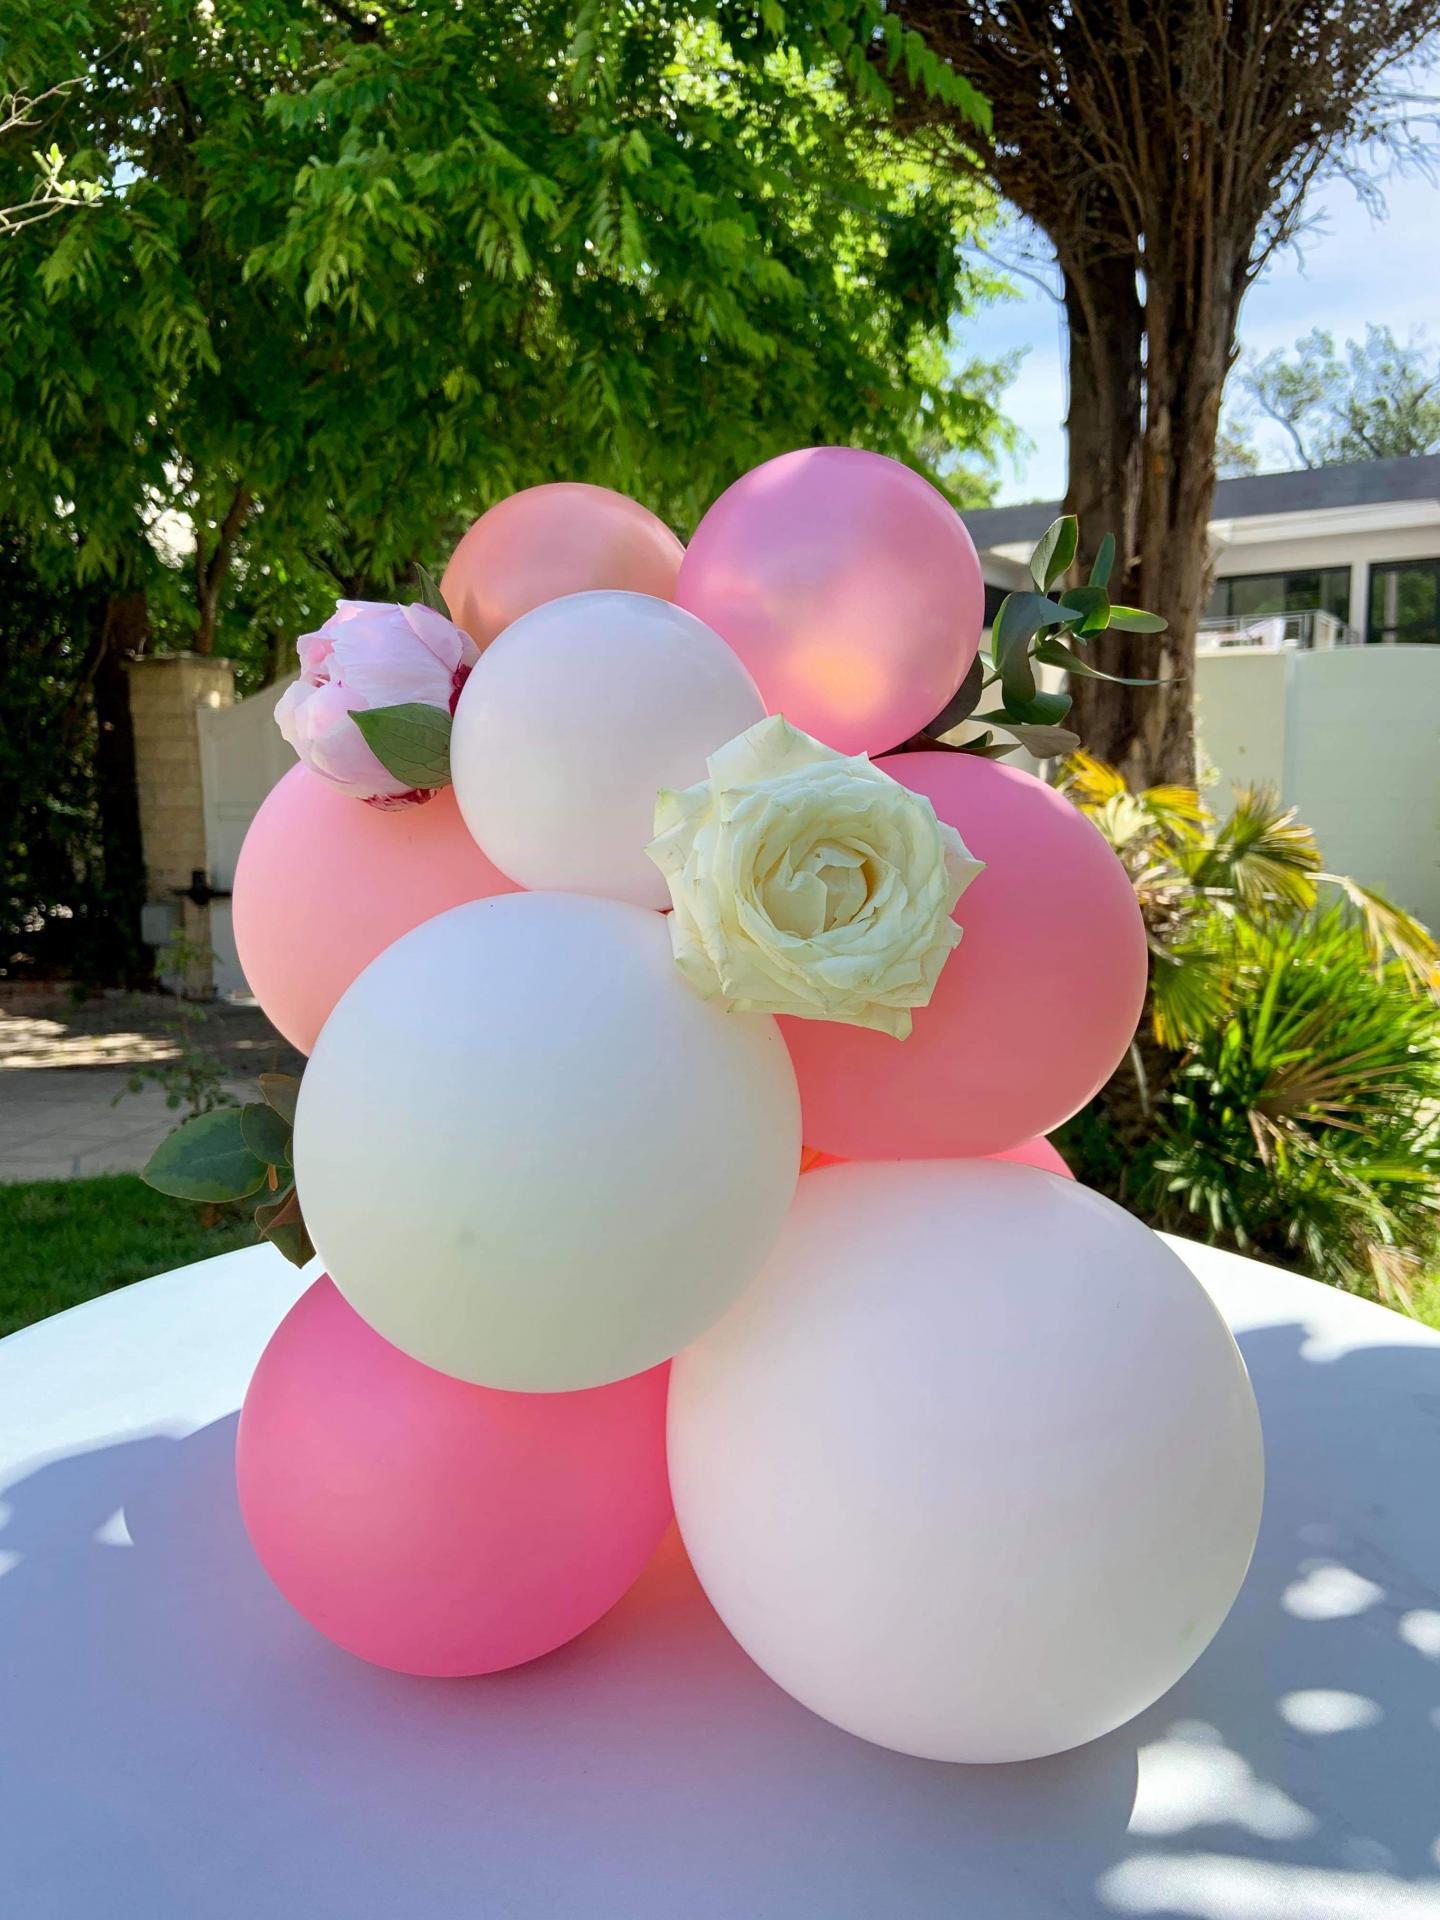 Fleurs et ballon en décor de buffet